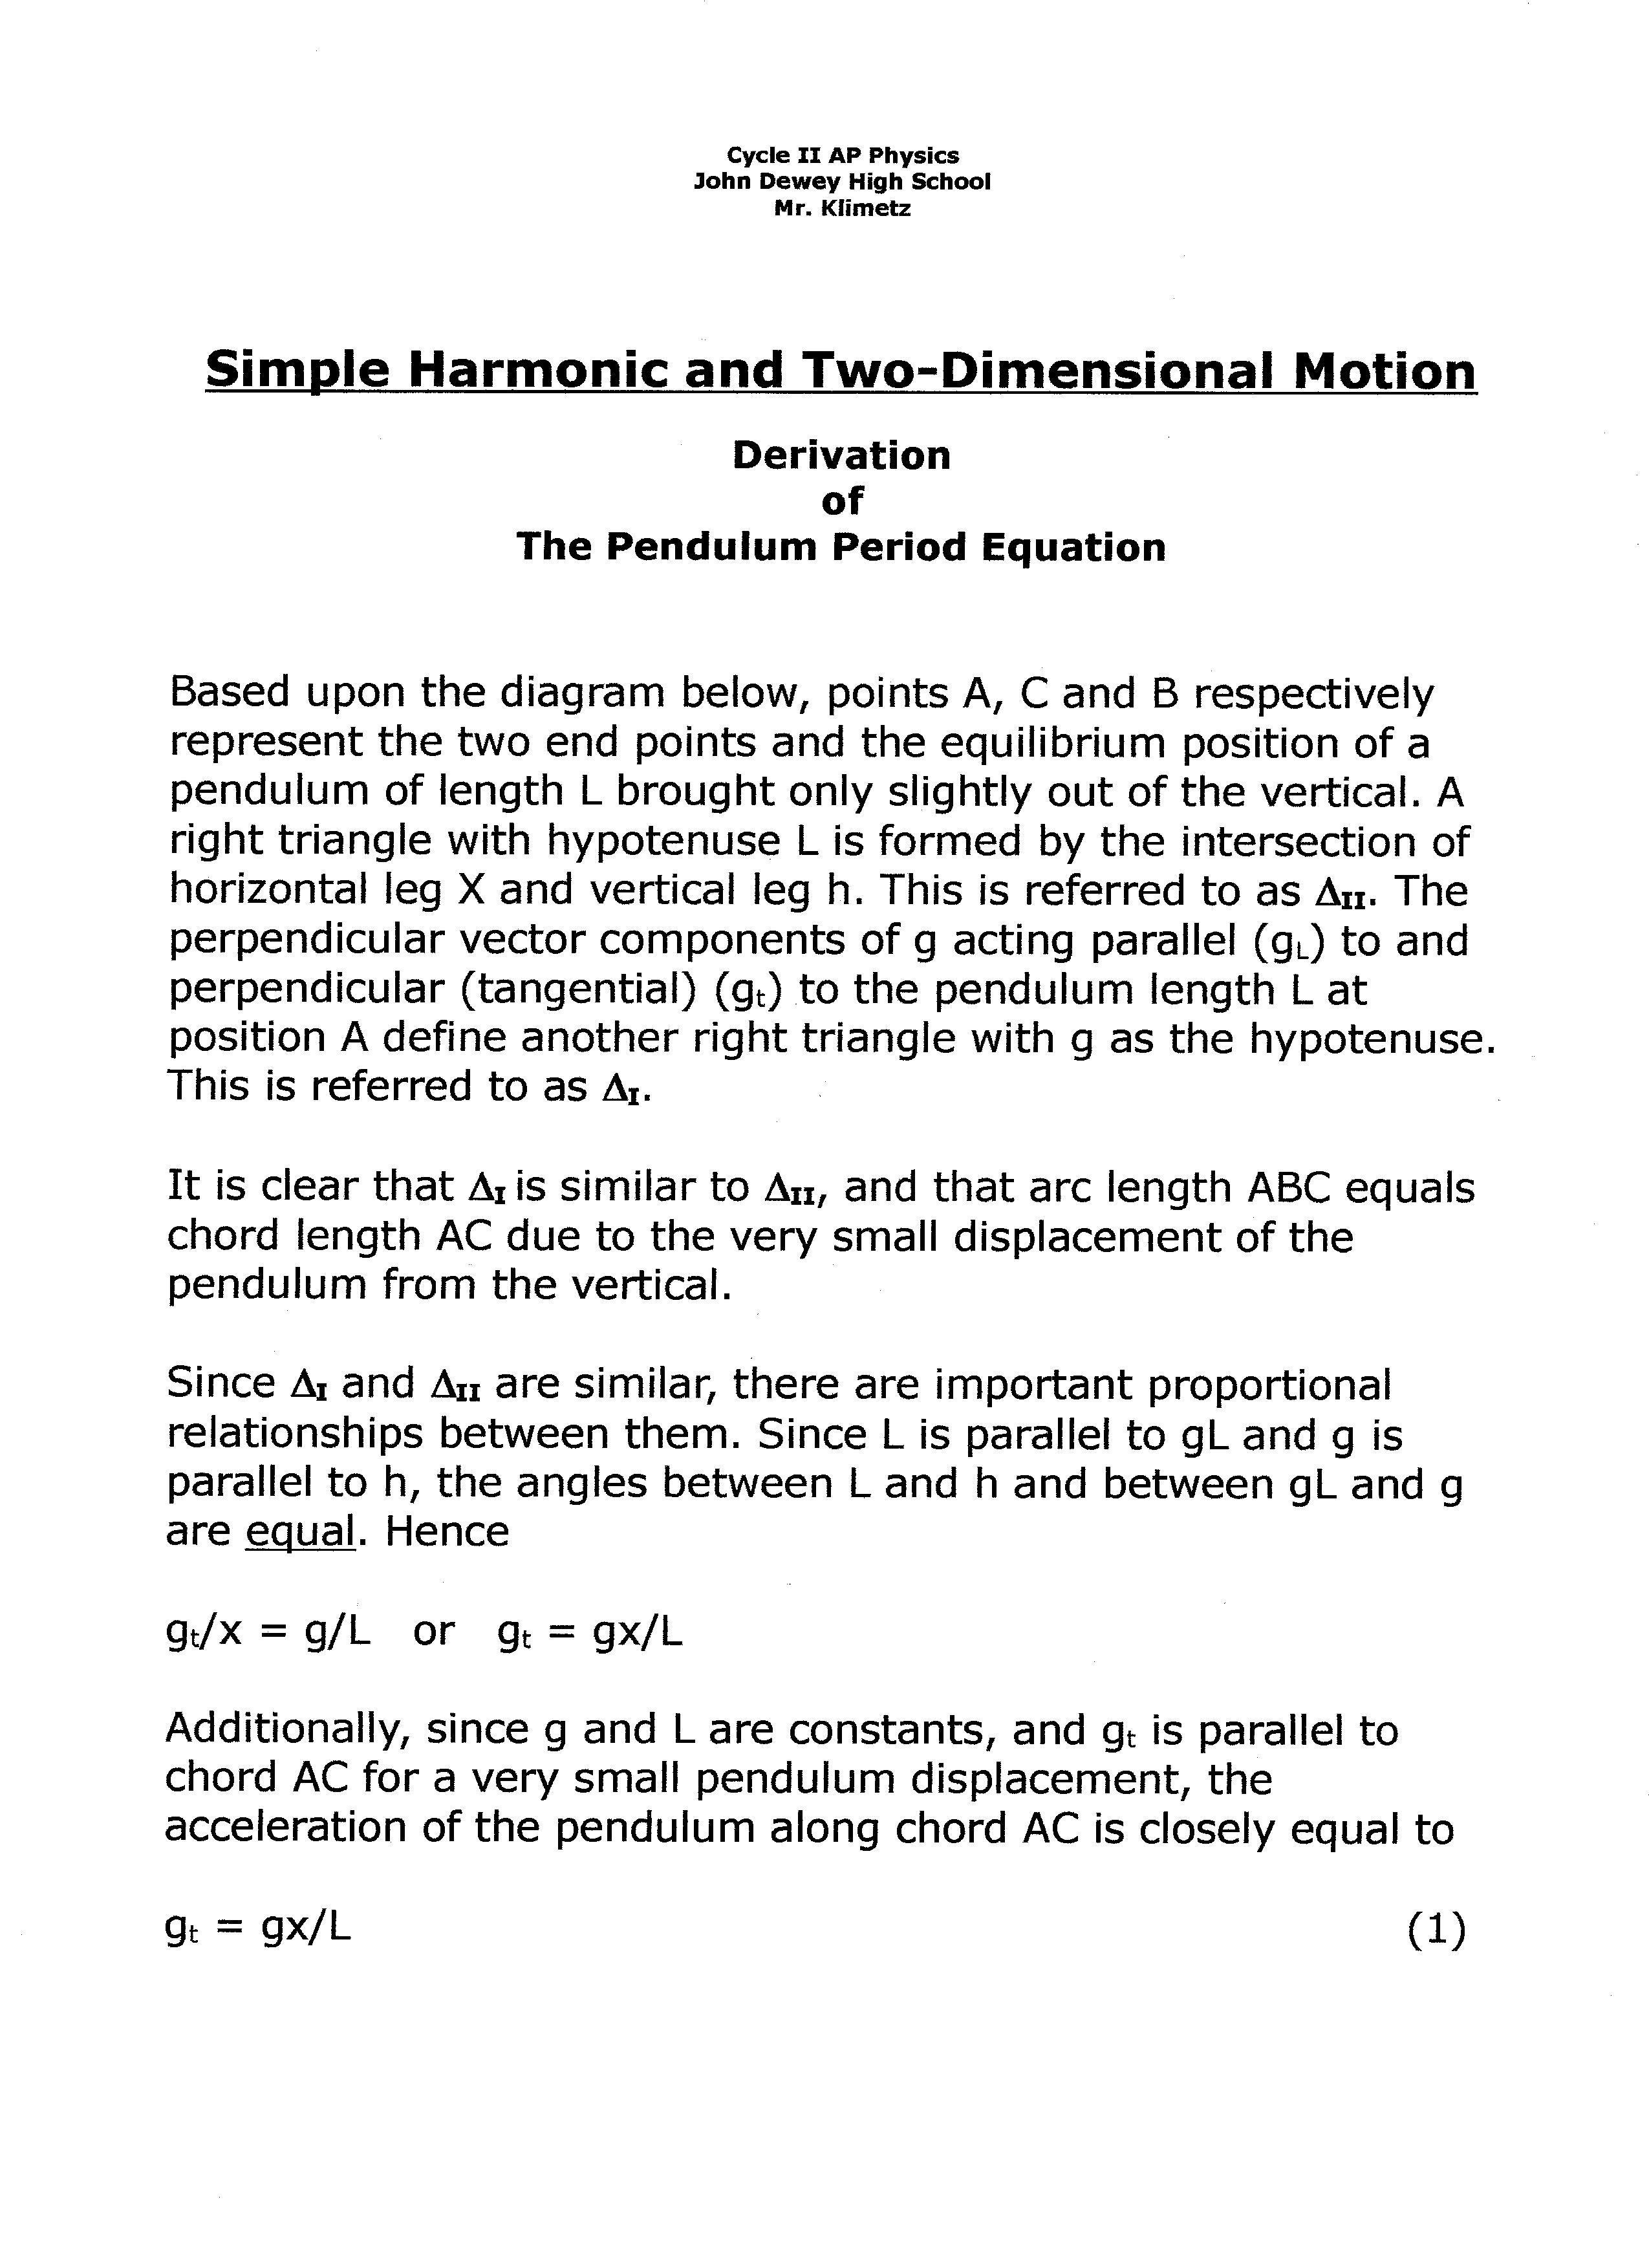 Shm Pendulum Motion Period Equation Derivation